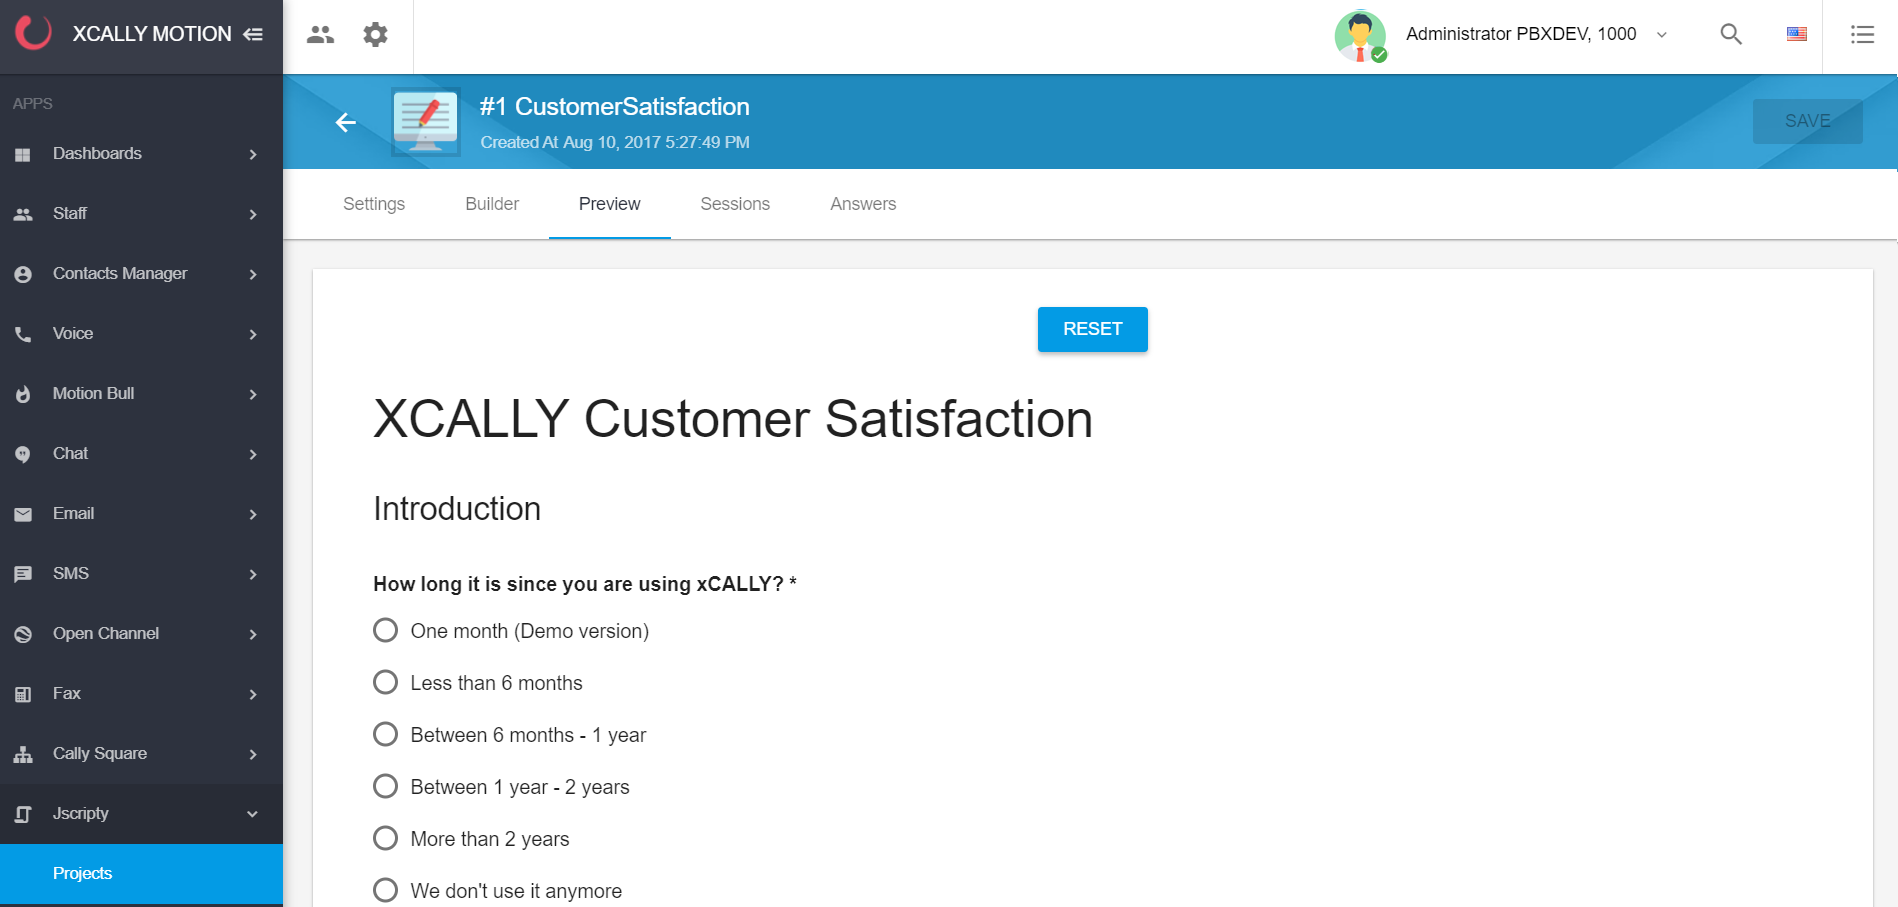 XCALLY Software - Customer Satisfaction